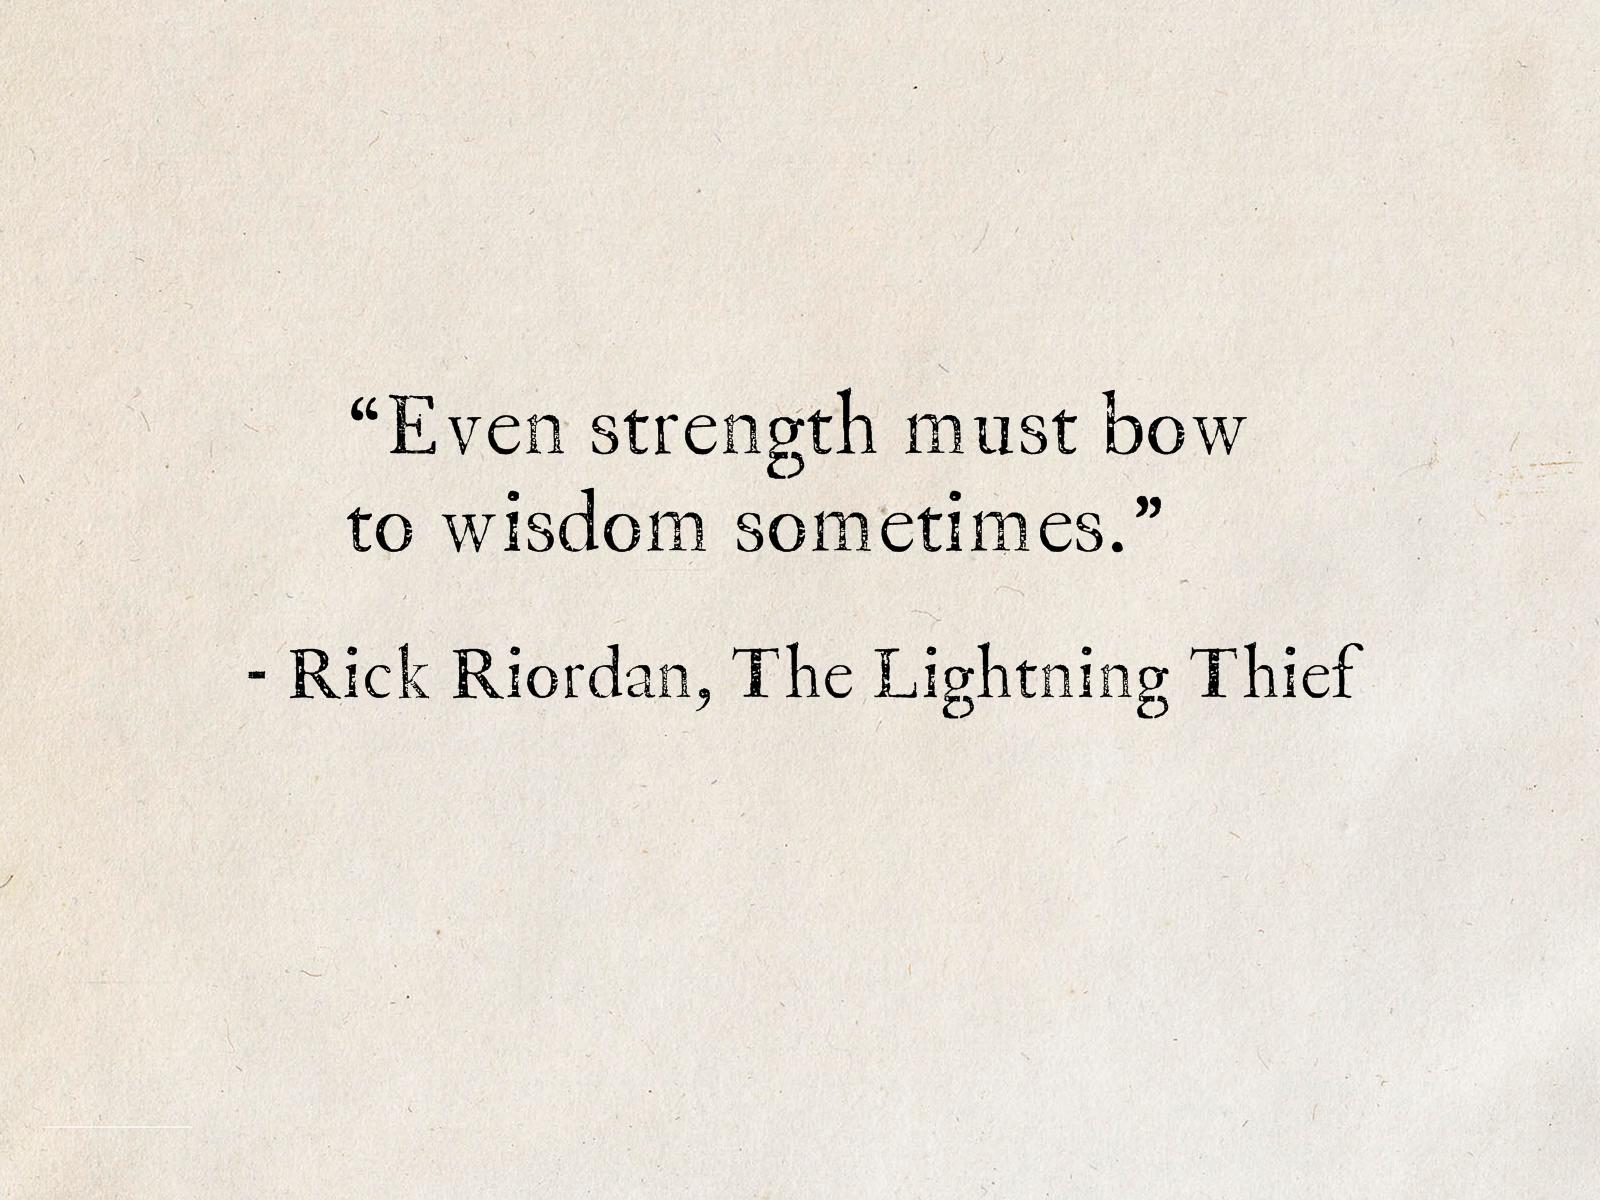 Rick Riordan The Lightning Thief Percy Jackson And The Olympians Percy Jackson Quotes Rick Riordan Quotes Book Quotes Tattoo